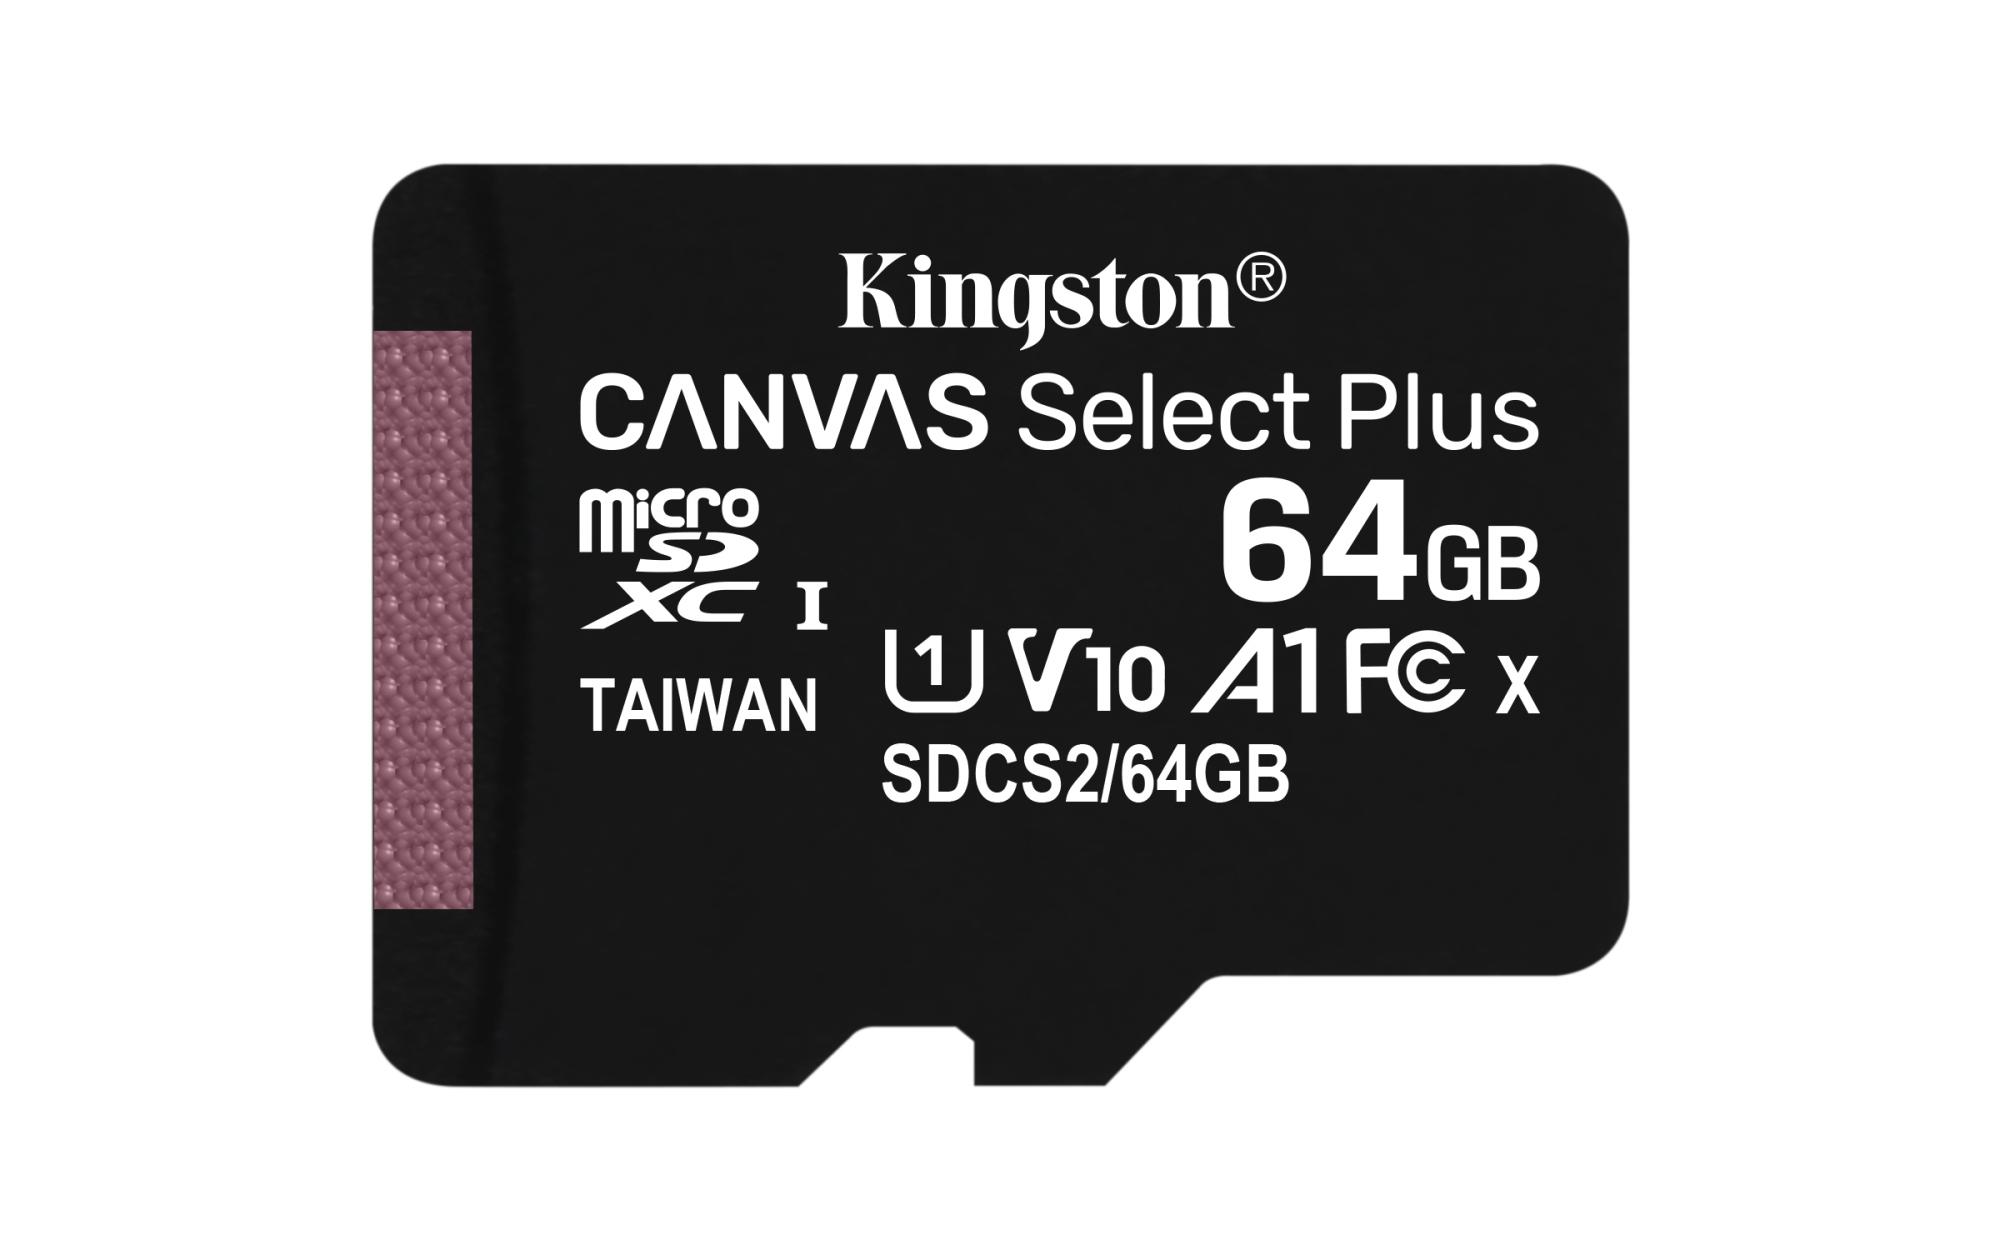 CANVAS SELECT PLUS MEMORIA FLASH 64 GB MICROSDXC CLASE 10 UHS-I